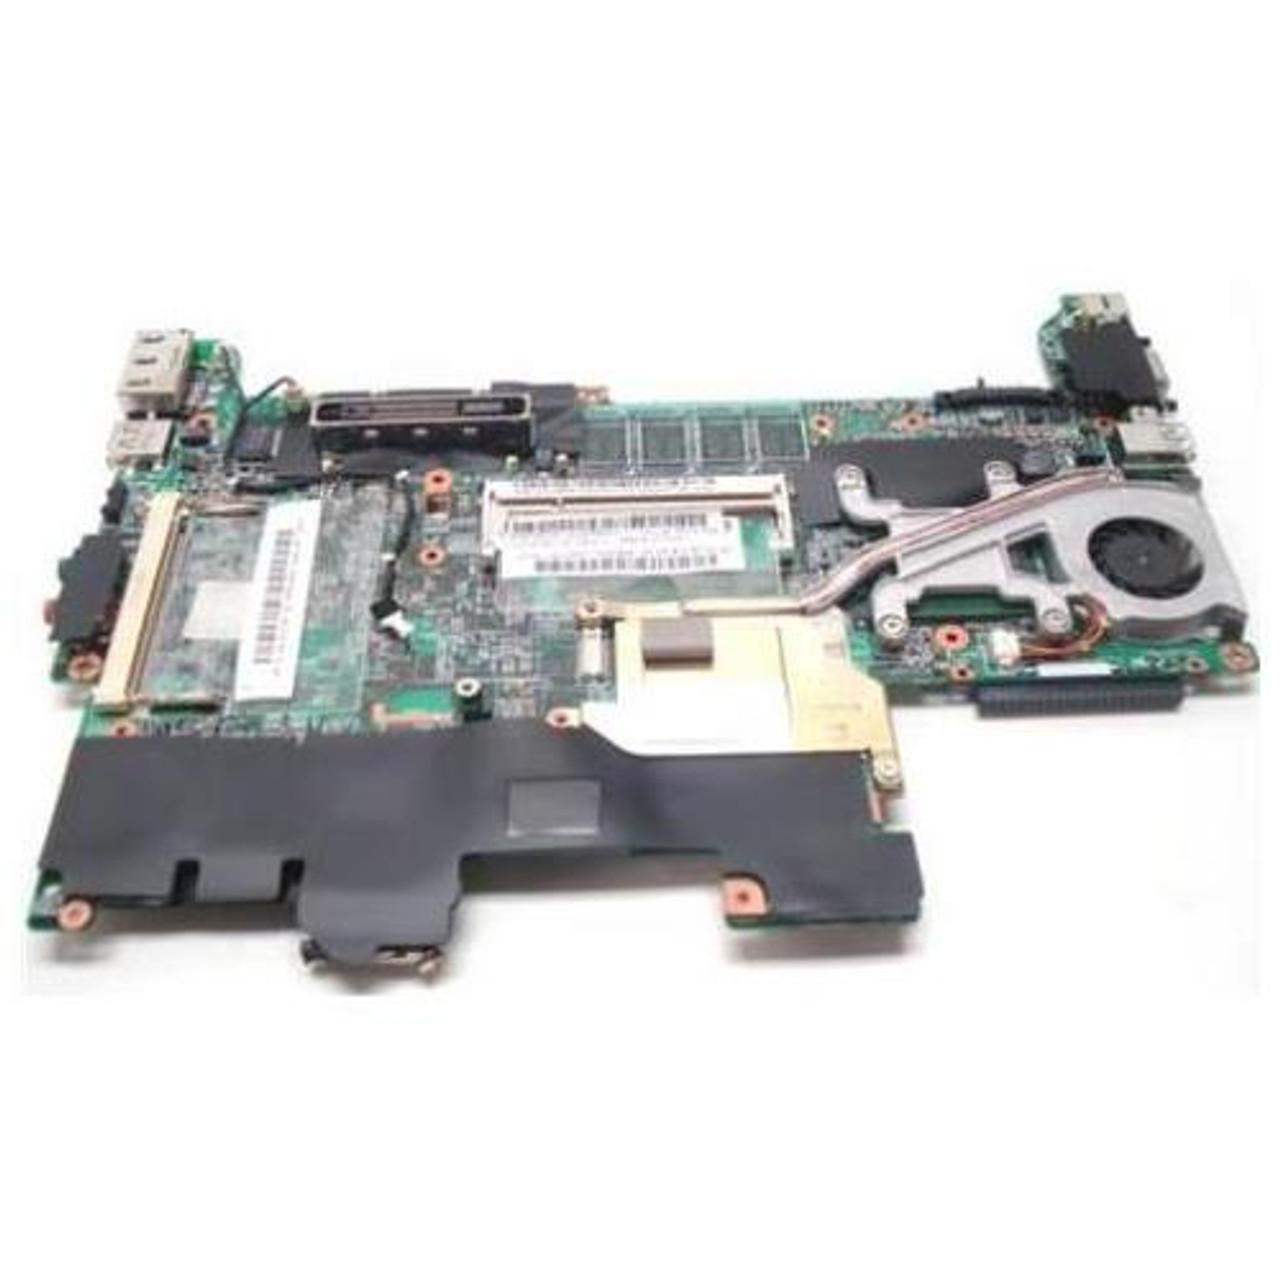 04W6687 Lenovo X230 System Board (Refurbished)